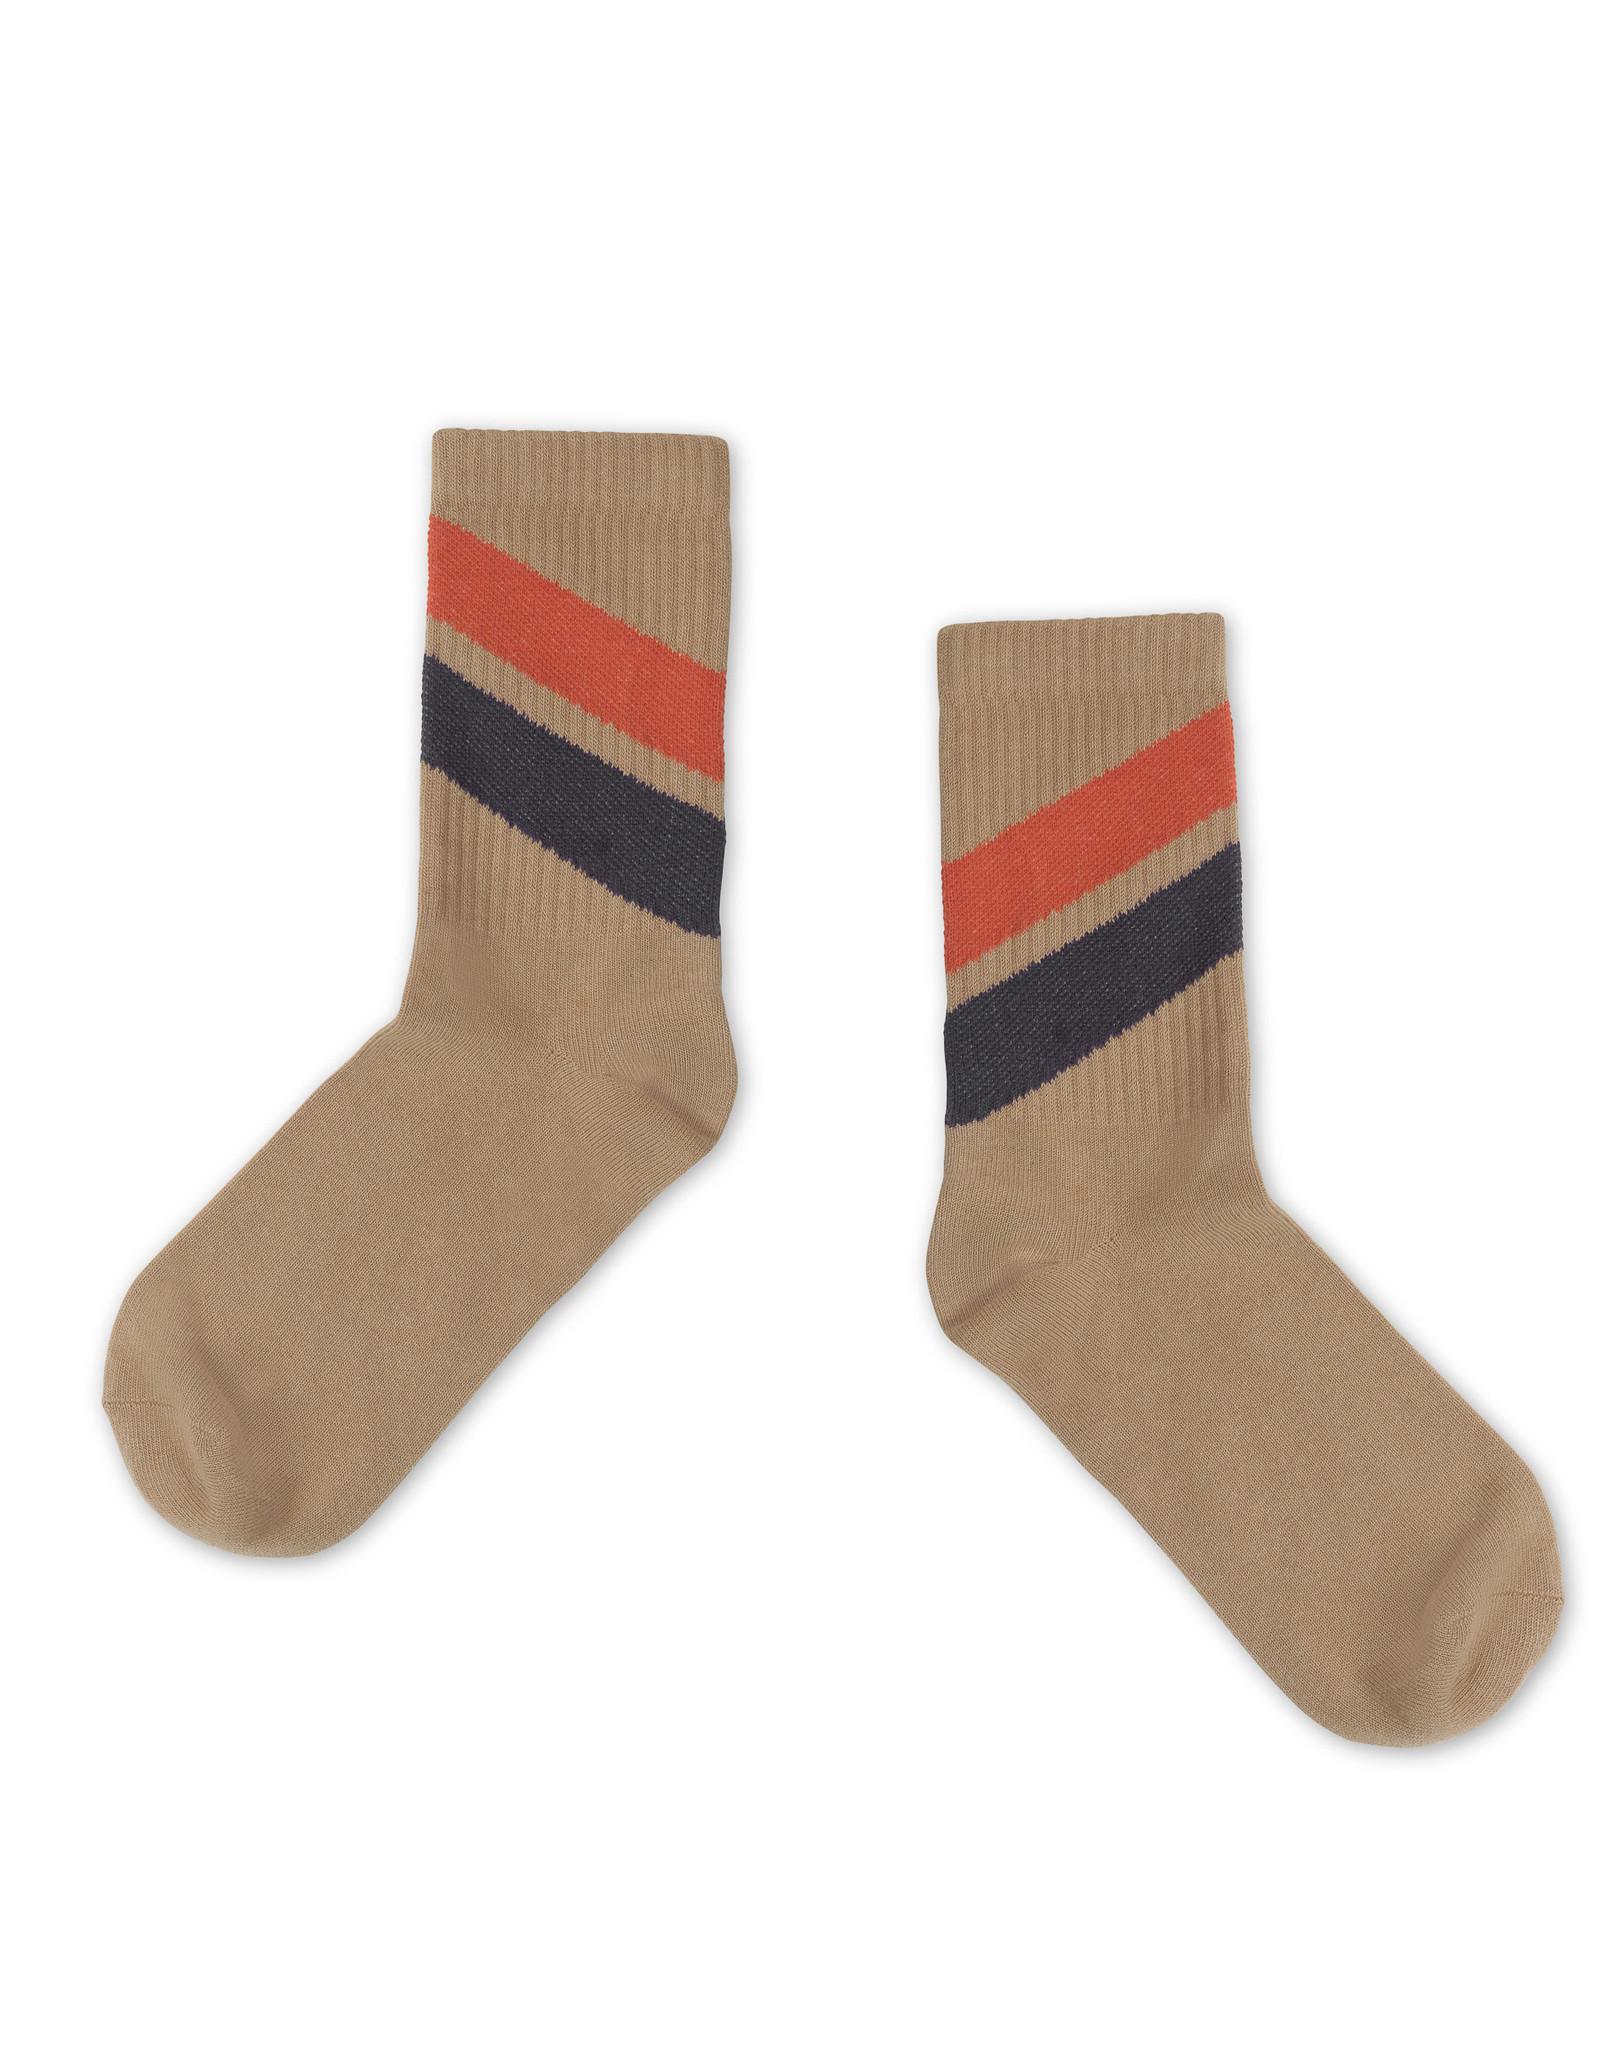 Repose Repose SS21 51 Socks